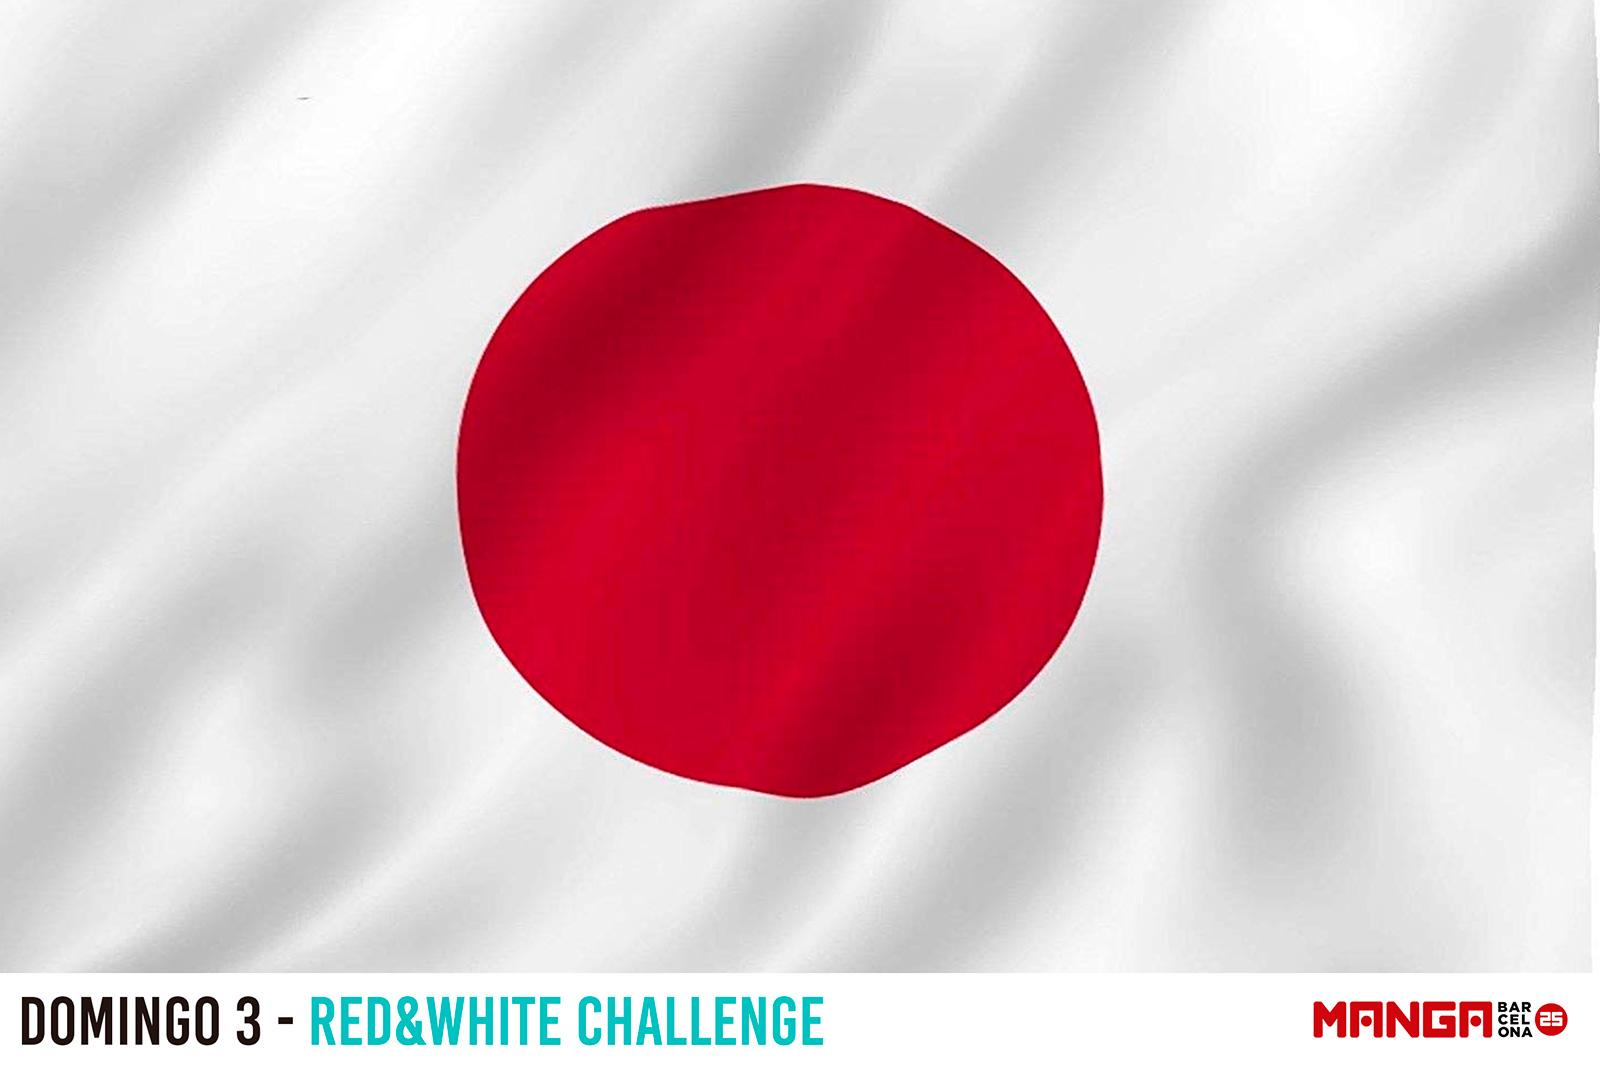 RED&WHITE CHALLENGE